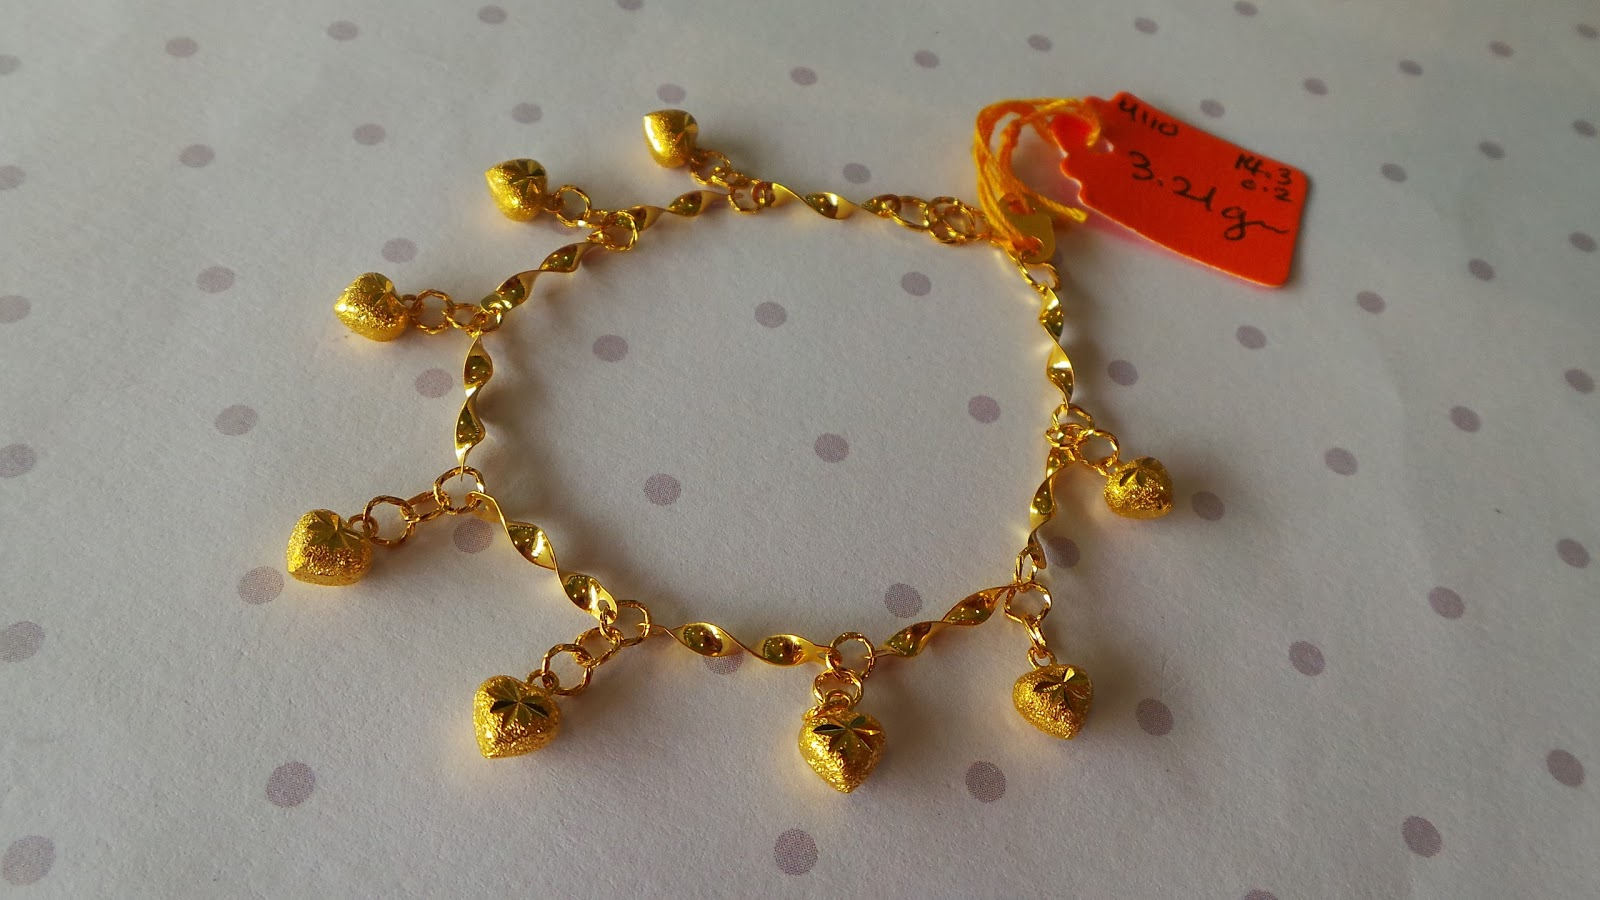 Galerry gambar rantai tangan emas